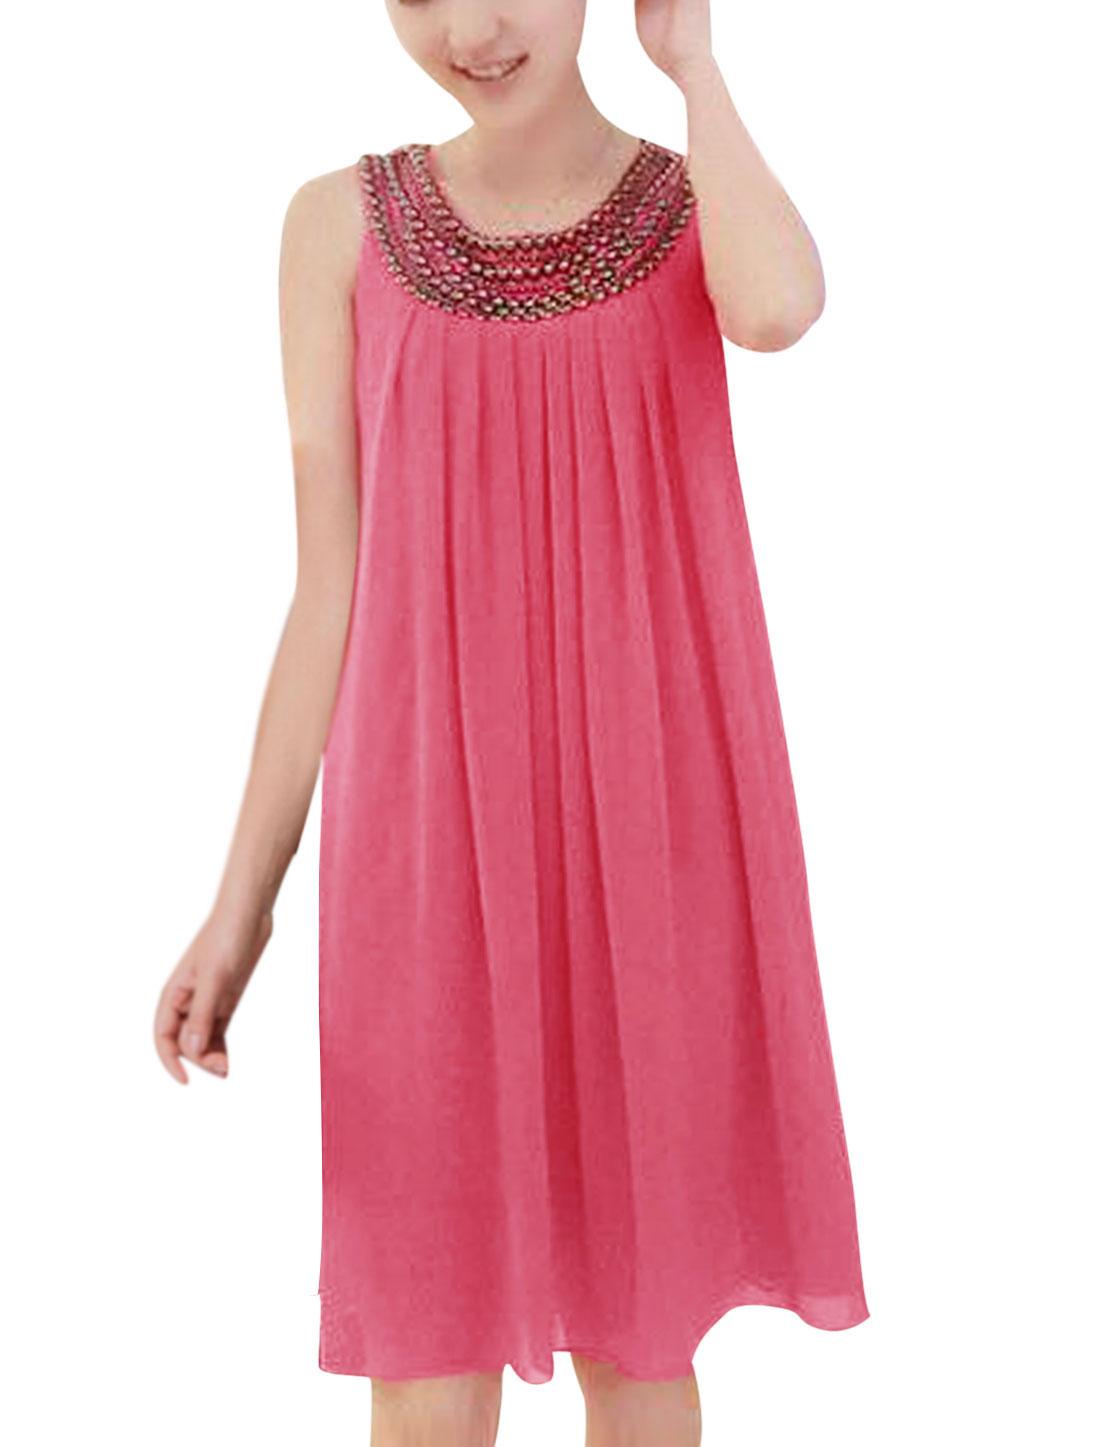 Lady Round Neck Sleeveless Beads Decor Stylish Dress Fuchsia XS